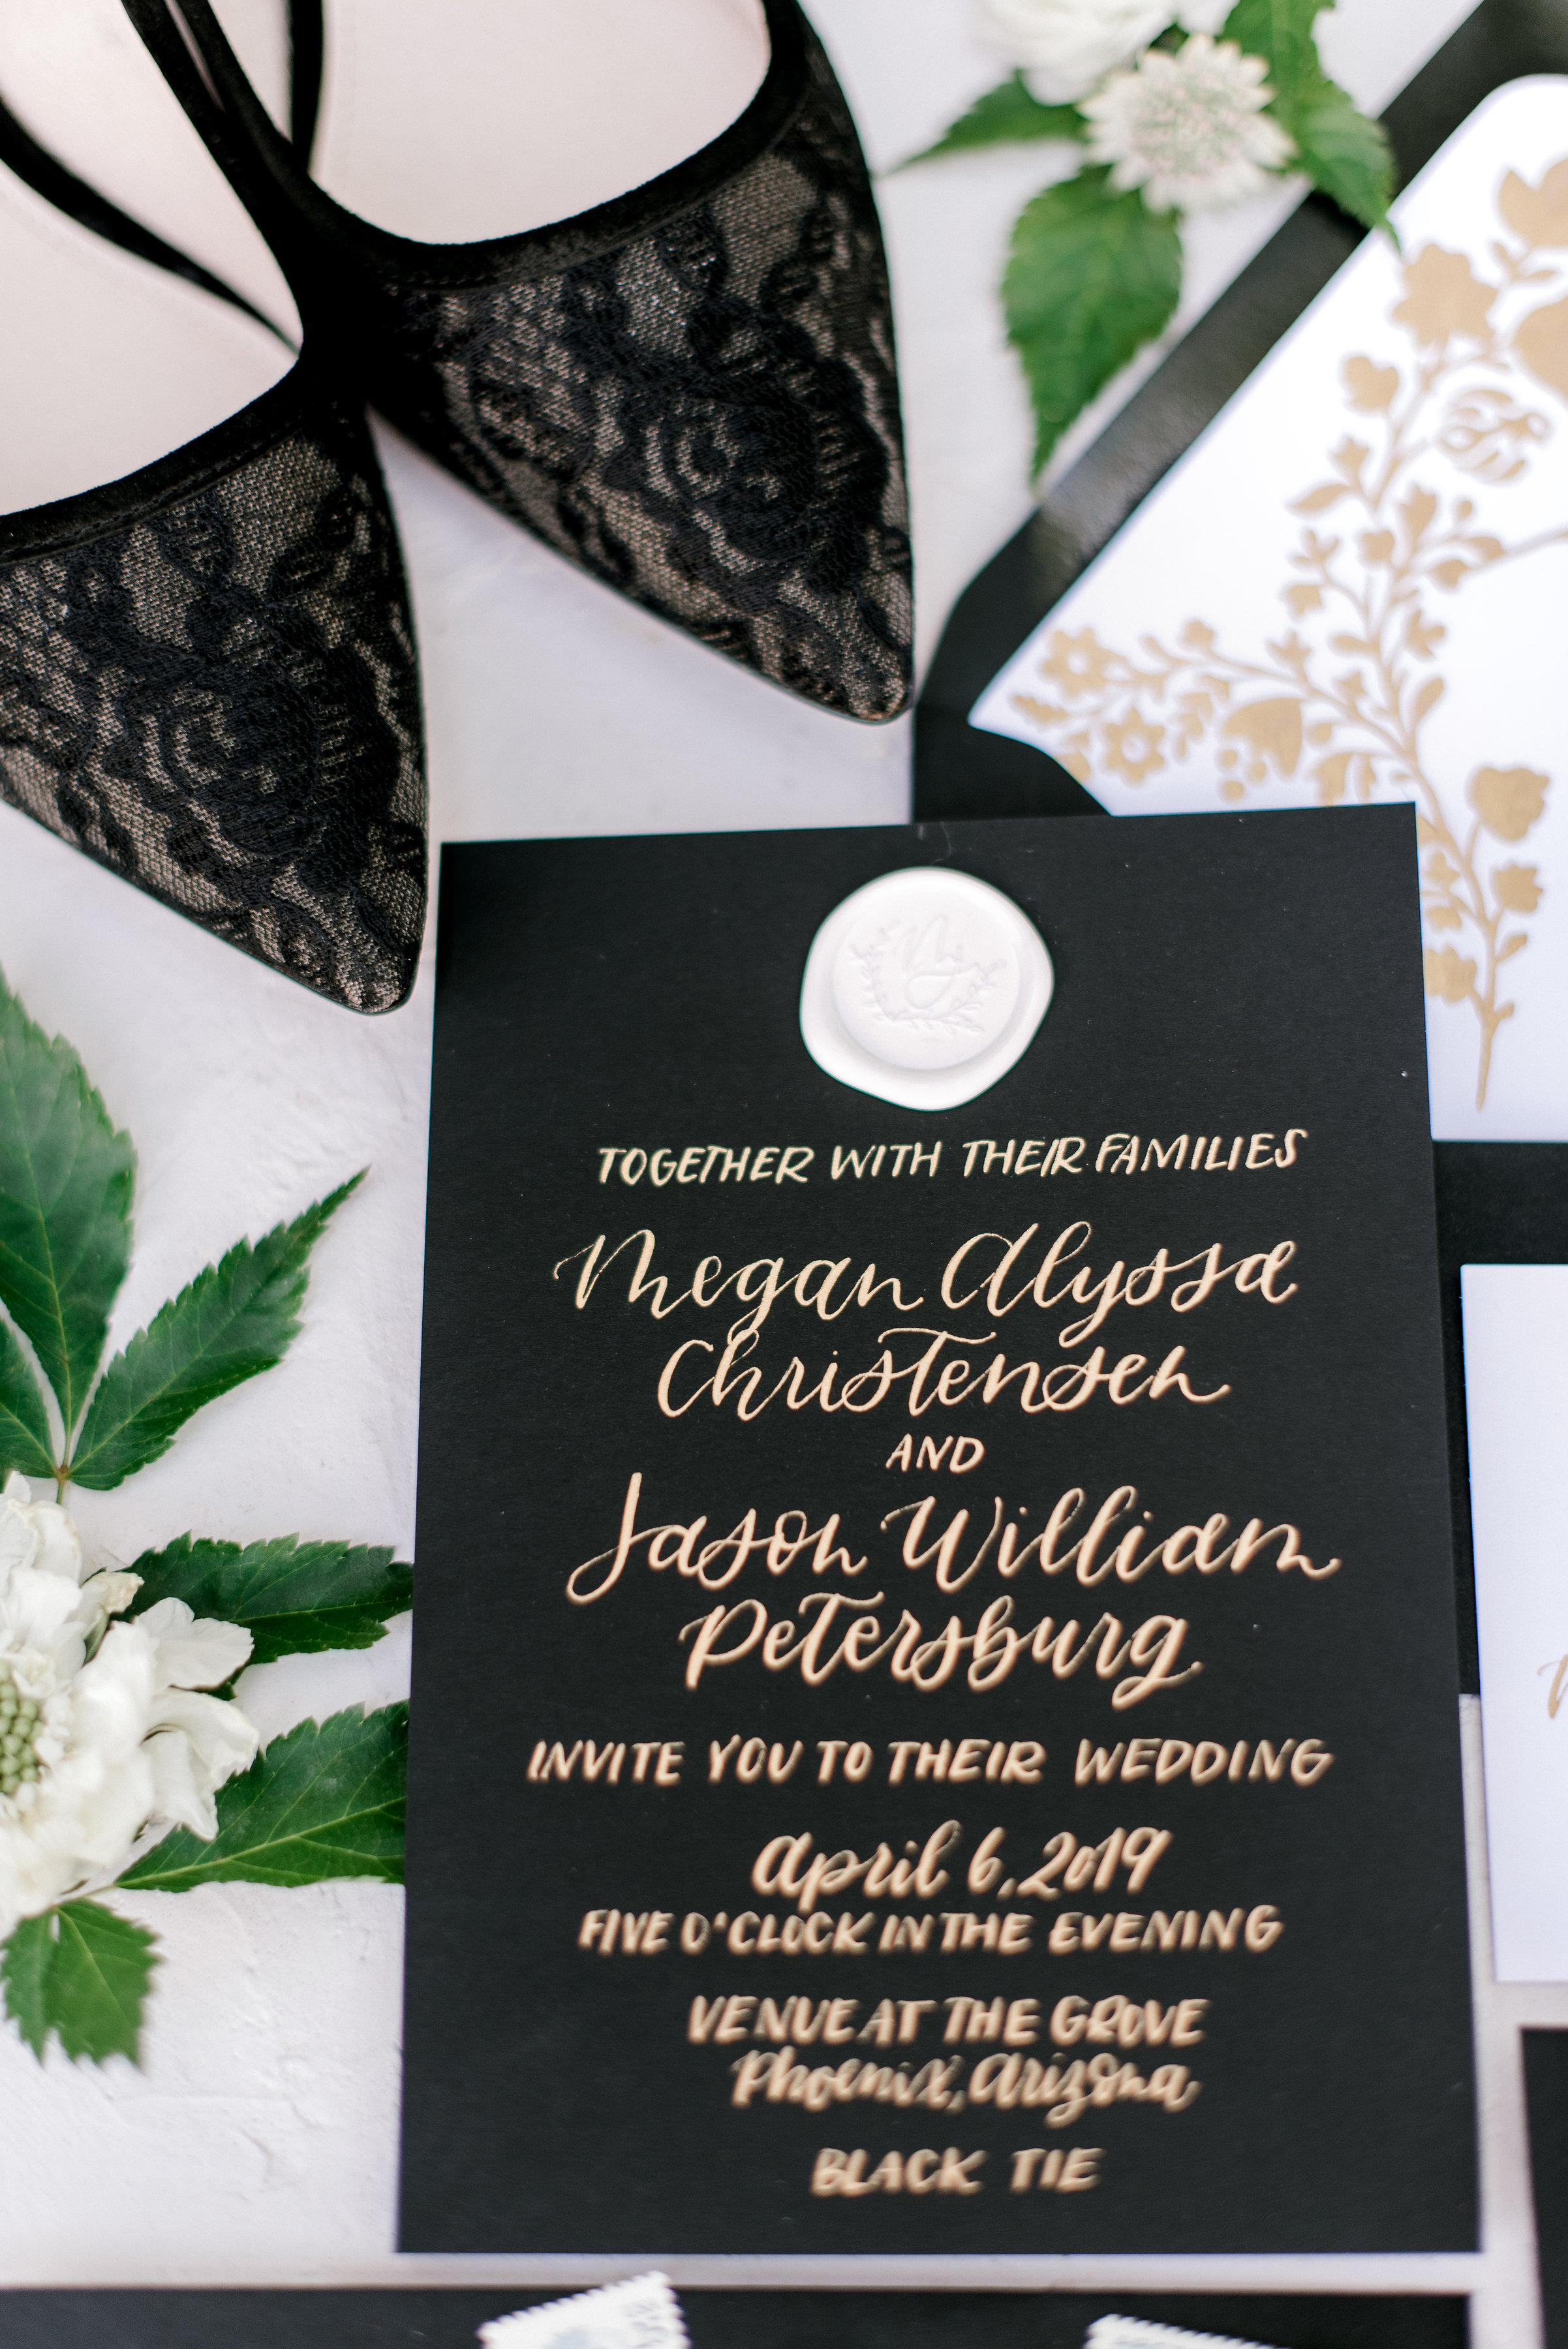 Black Tie Garden Wedding Styled Shoot Inspired by The Royal Wedding featured on Arizona Weddings- Konsider It Done- AZ Arizona Wedding & Event Planner, Designer, Coordinator Planning in Scottsdale, Phoenix, Paradise Valley, Tempe, Gilbert, Mesa, Chandler, Tucson, Sedona